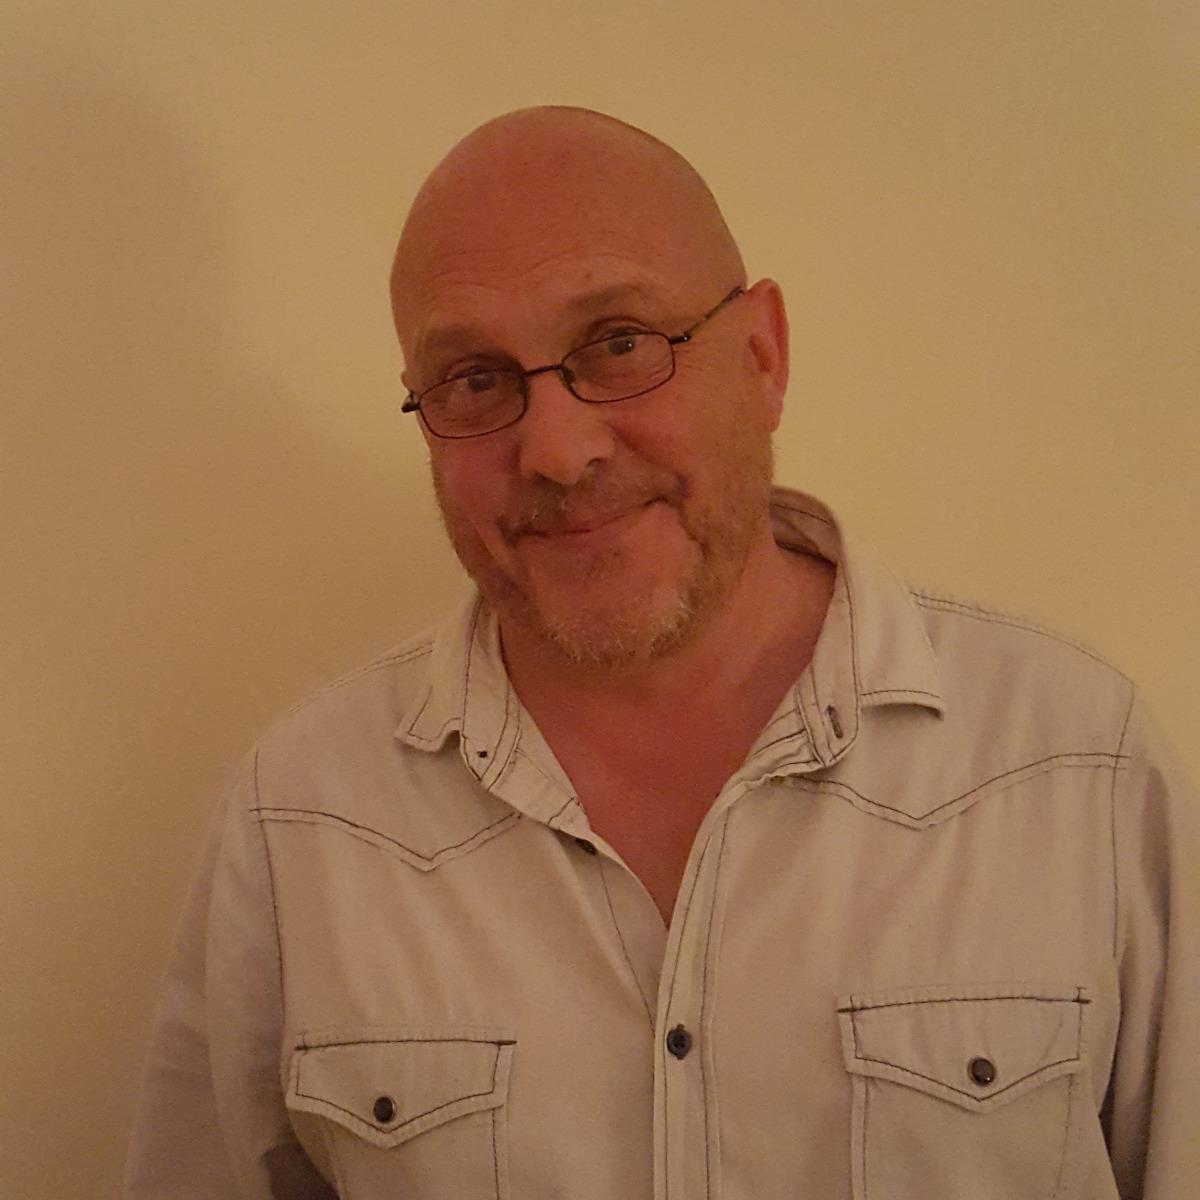 Ian Summers-Noble